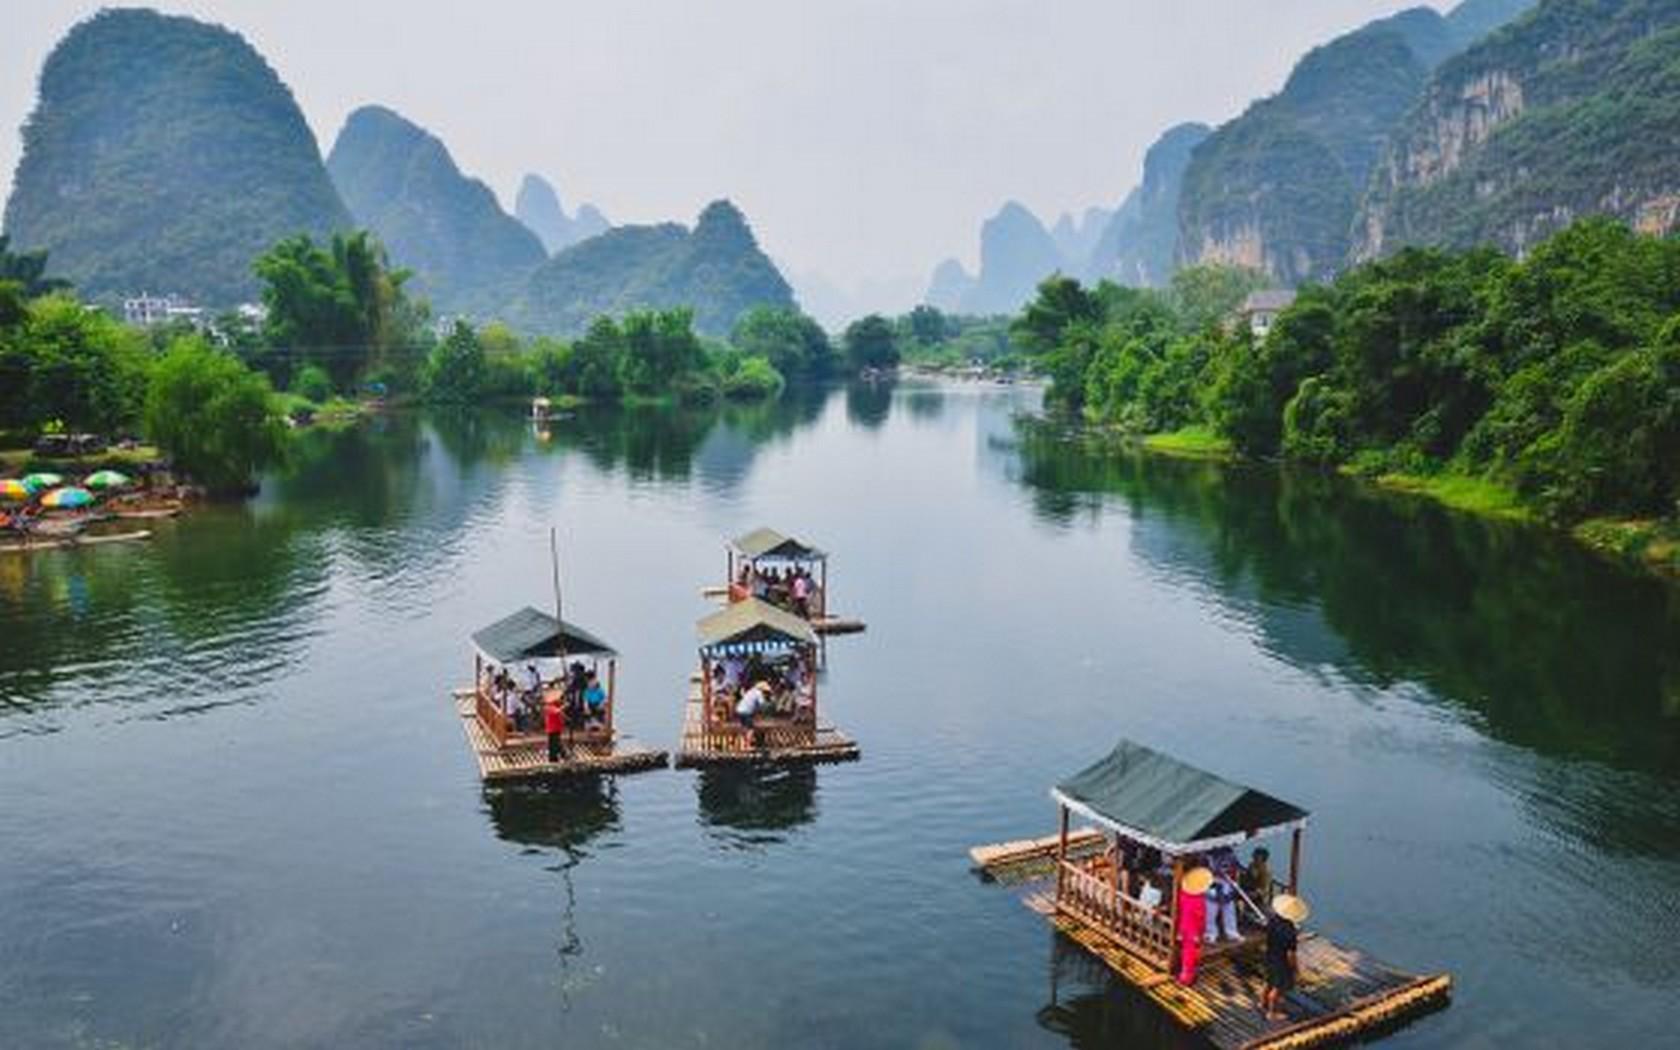 Paisajes en China